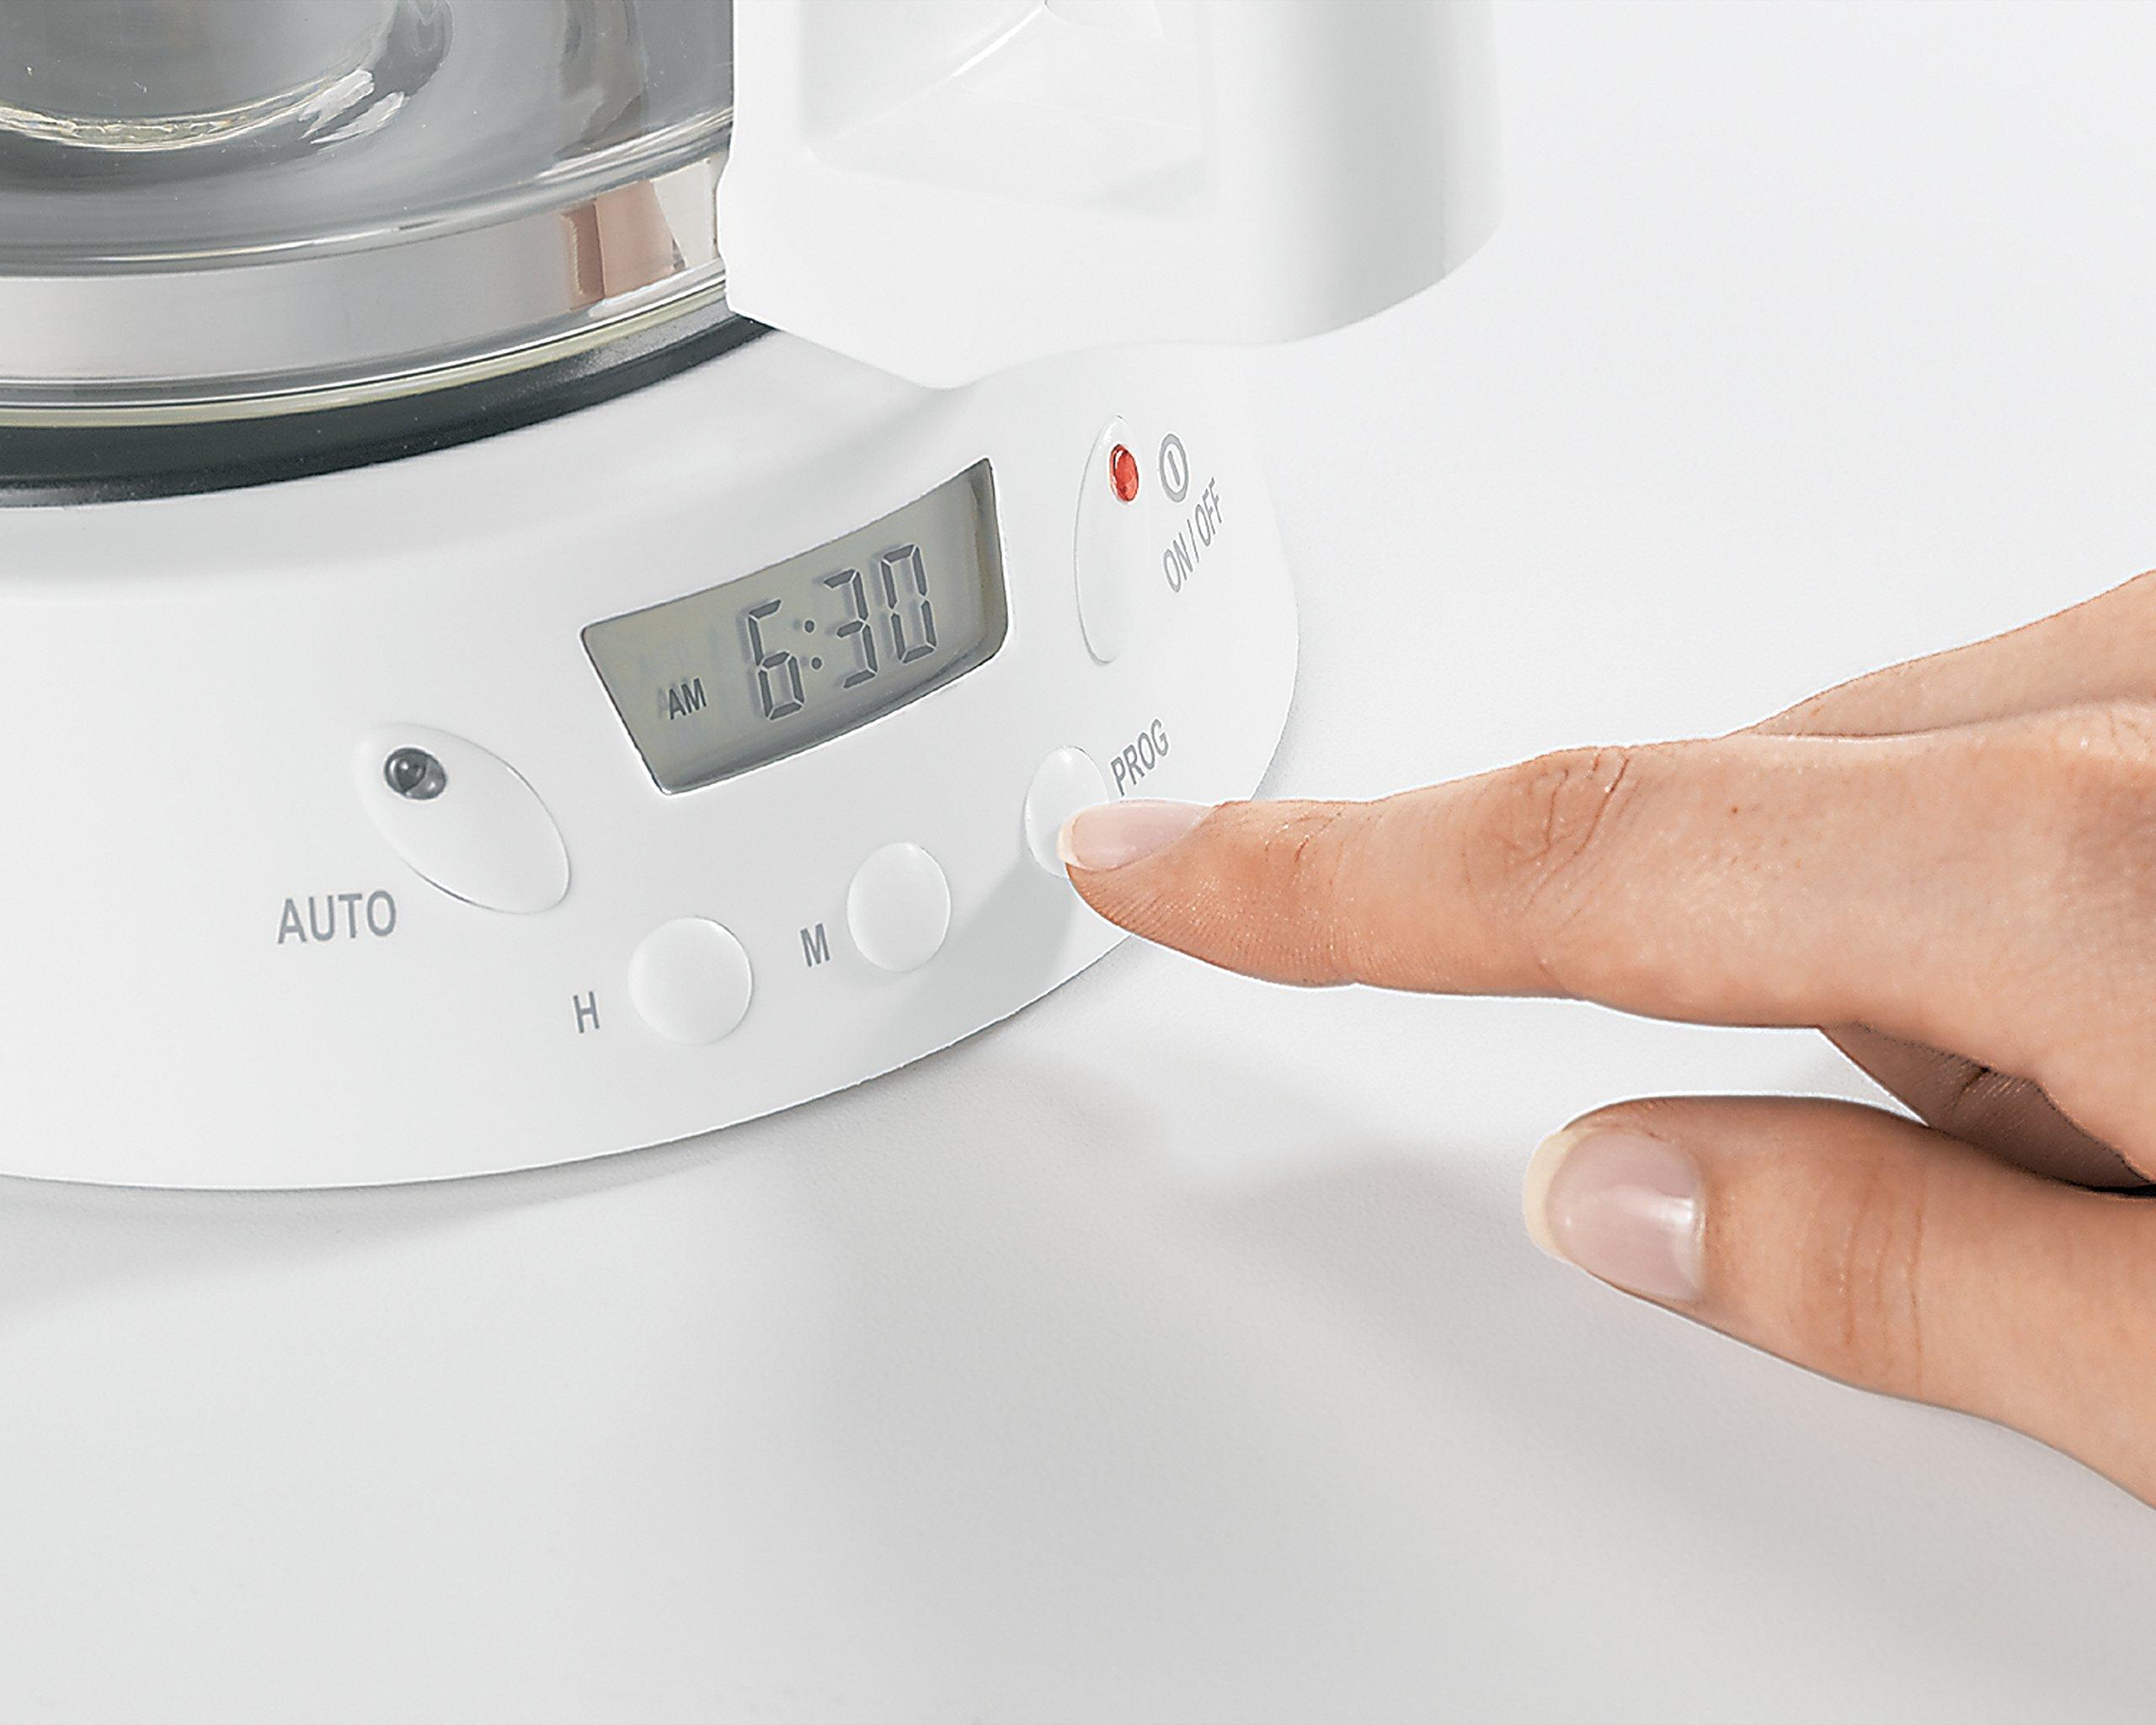 Proctor-Silex Automatic Coffee Maker (43571)